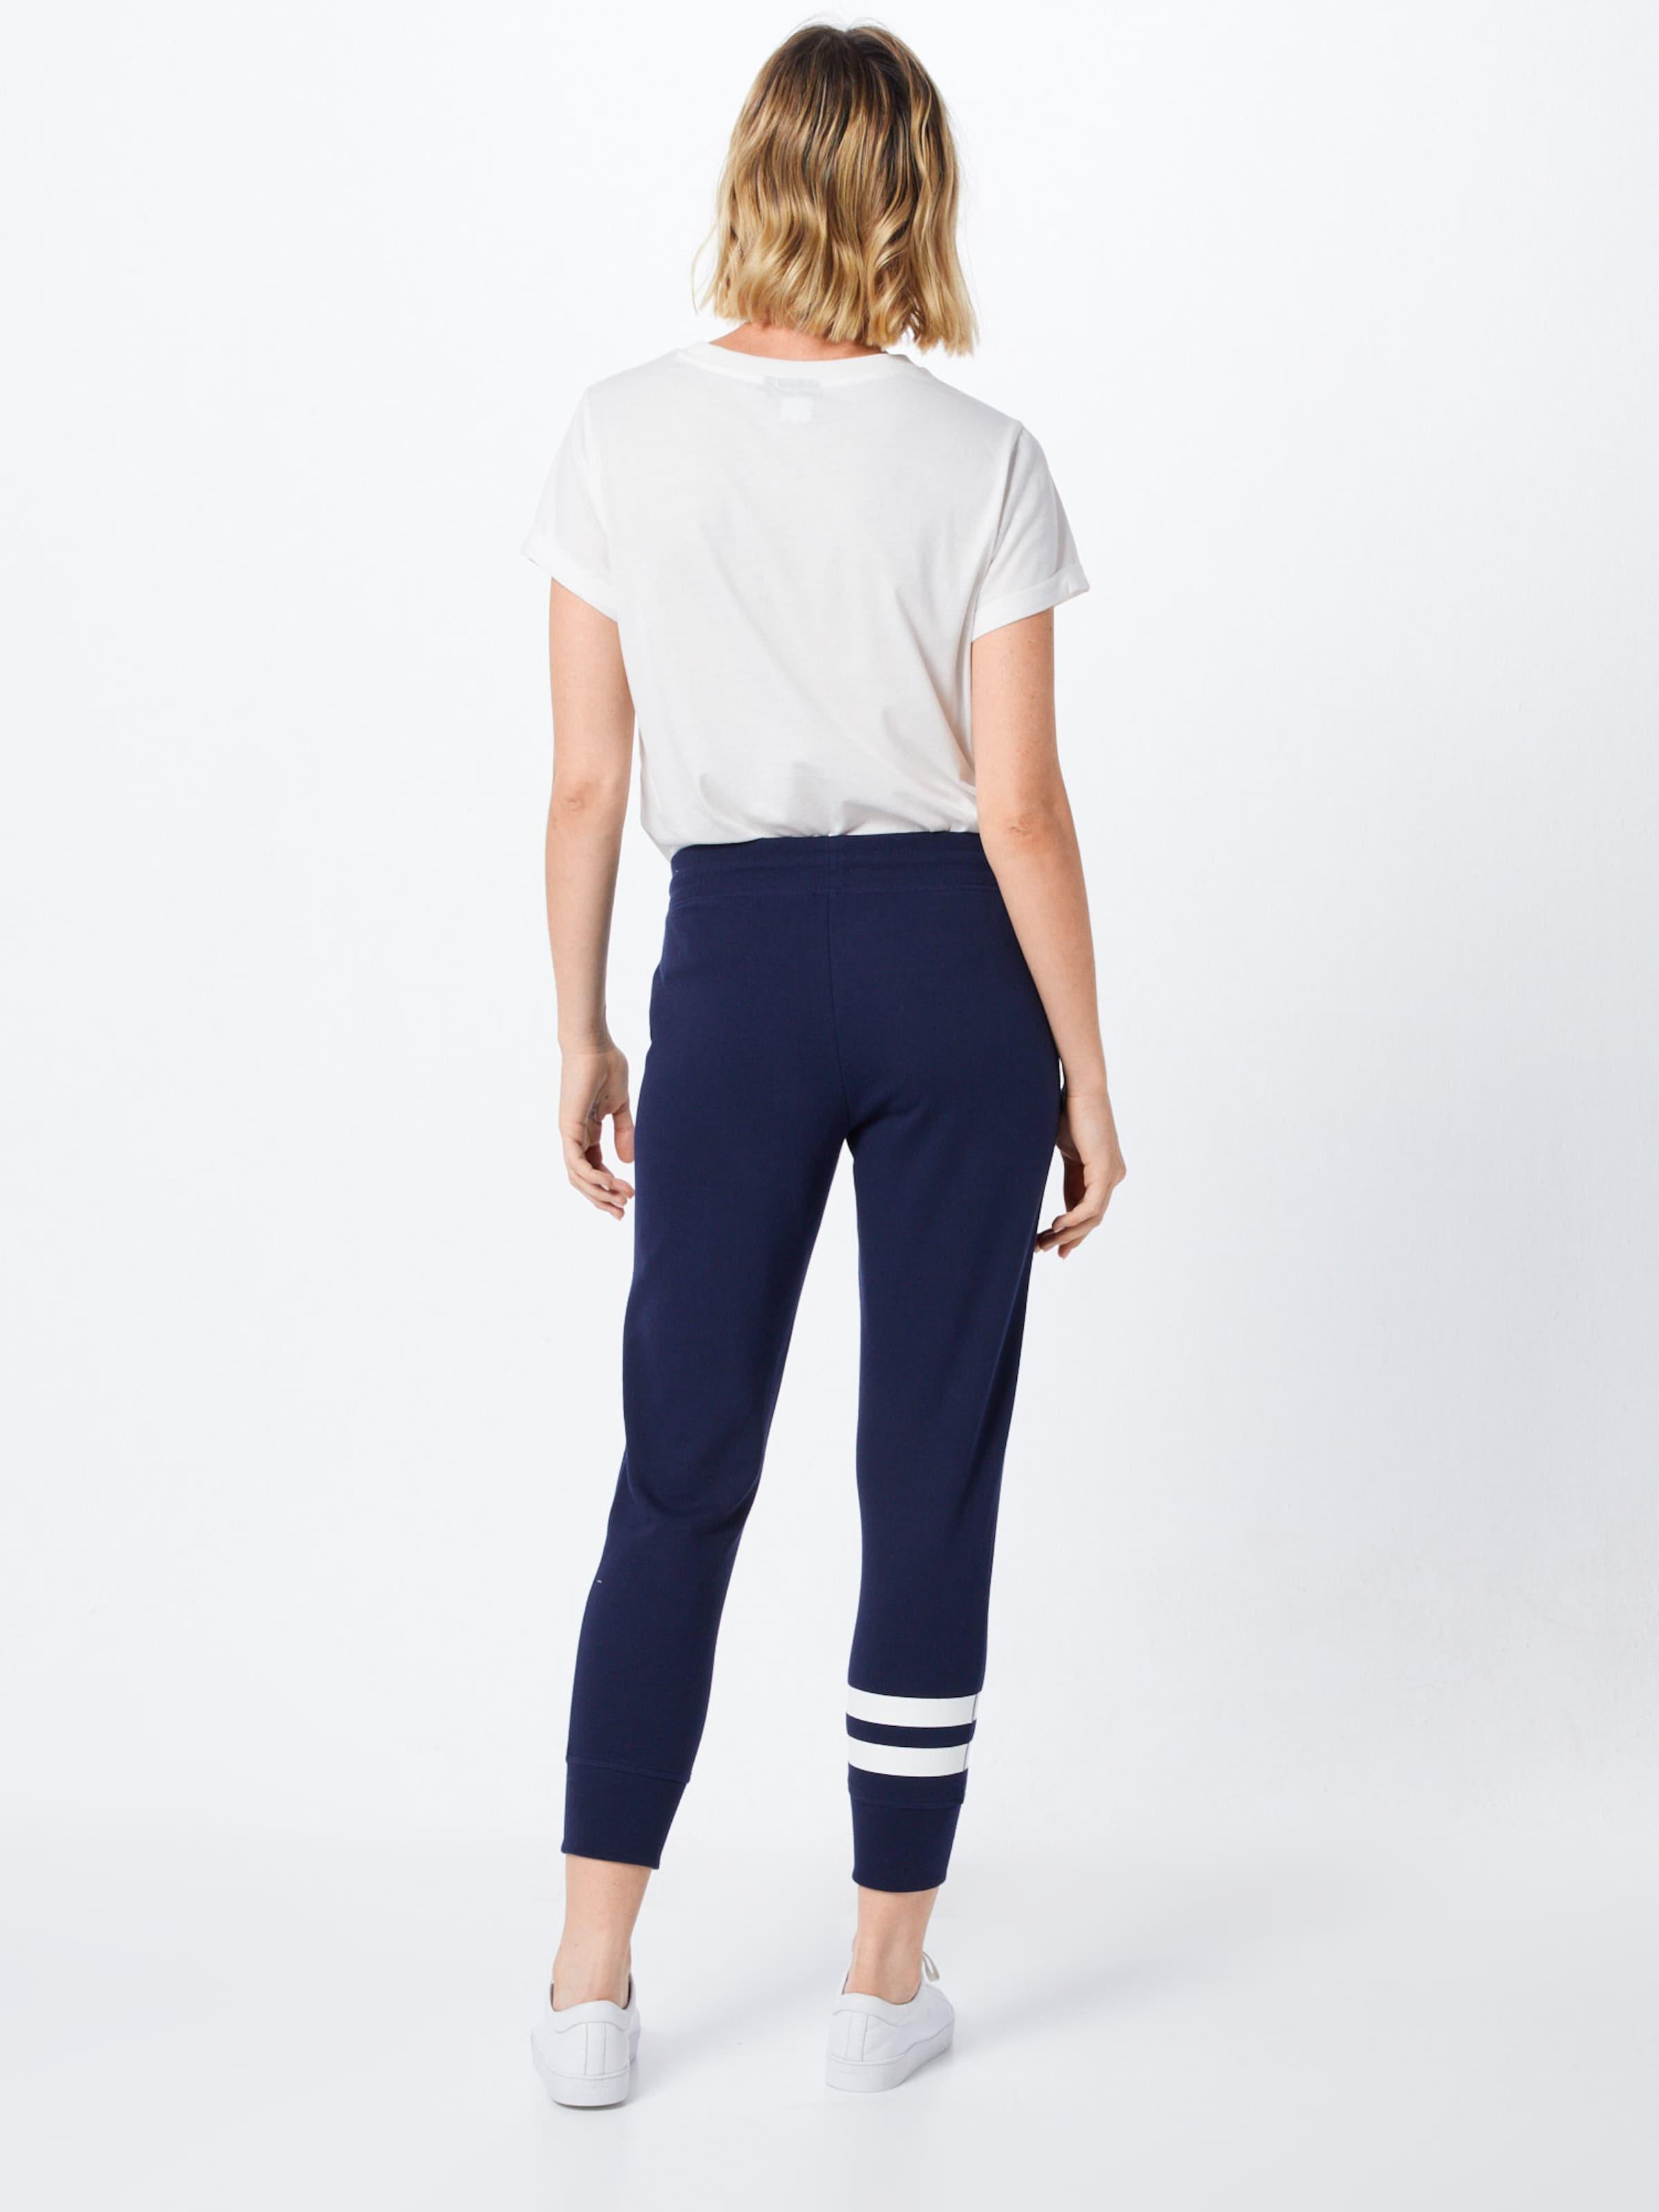 En Bleu Gap Pantalon Pantalon En Marine Gap WE9HIY2D